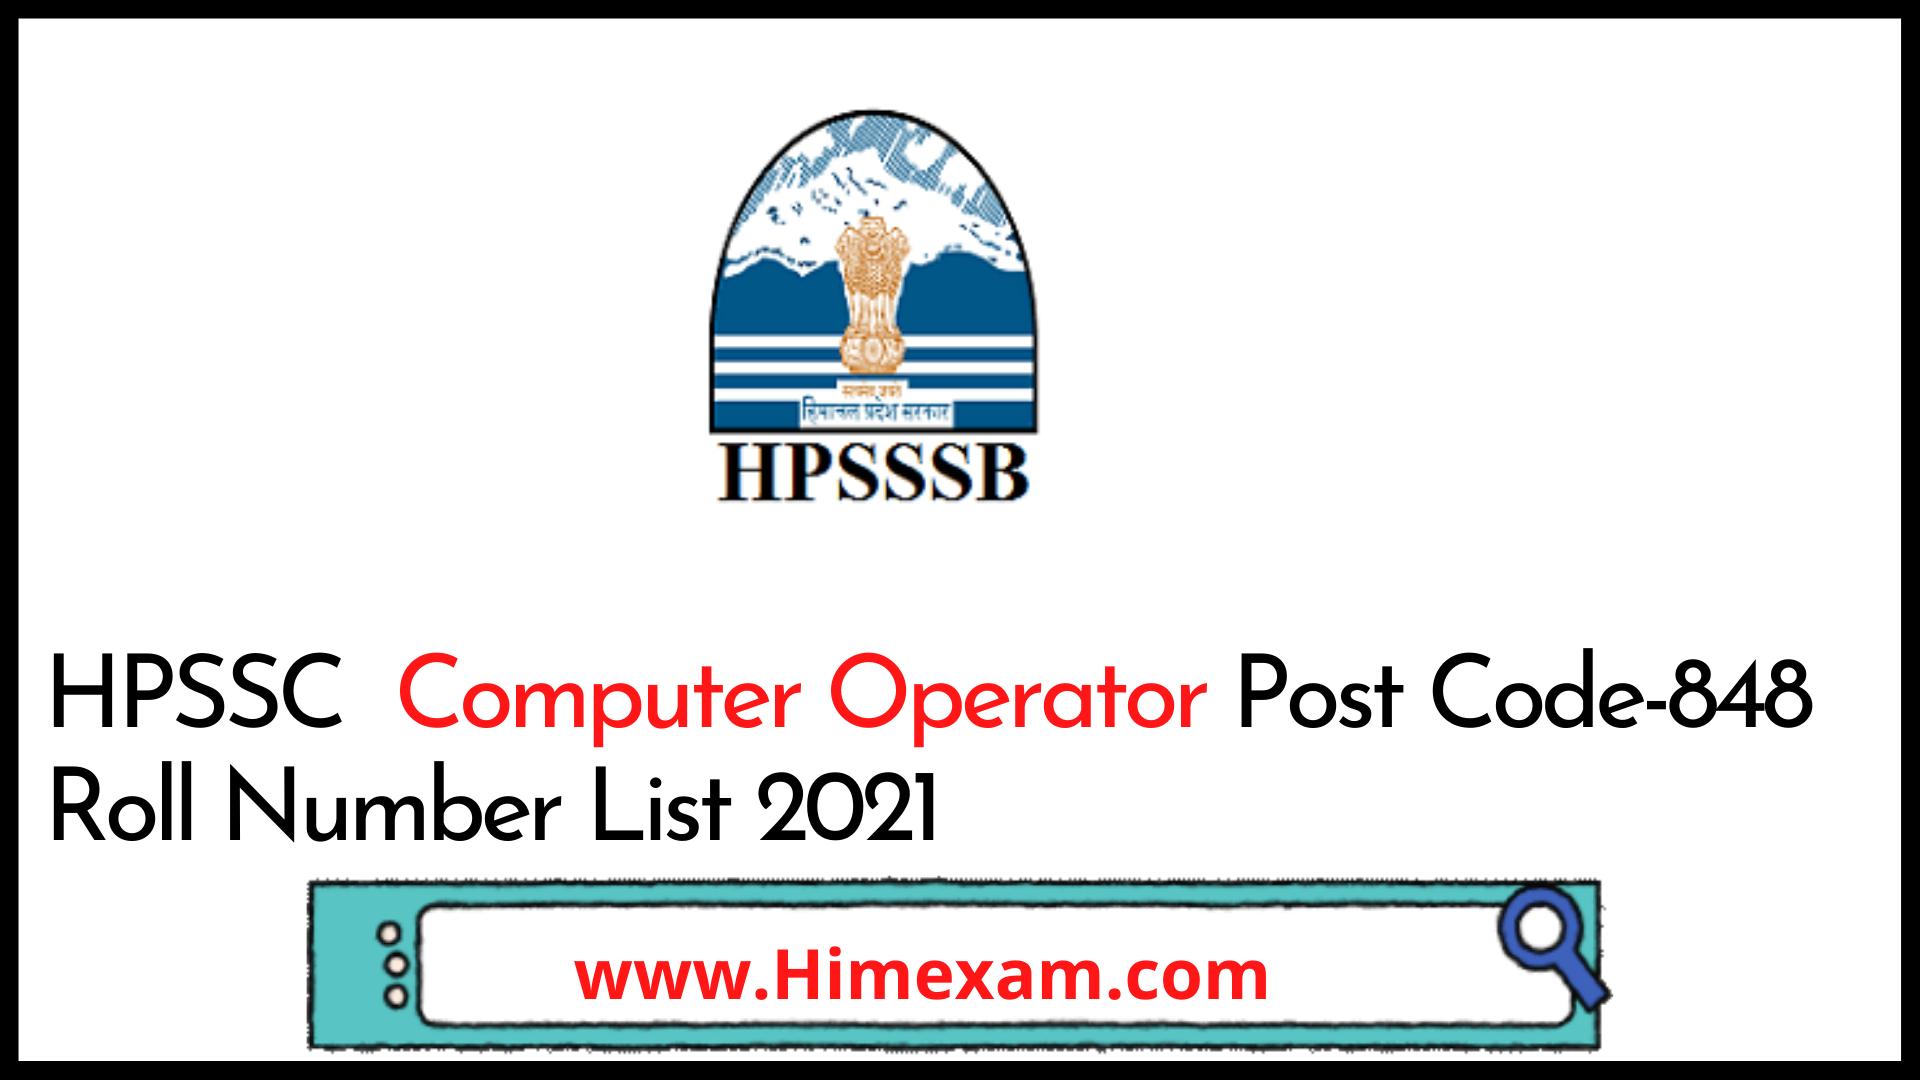 HPSSC  Computer Operator Post Code-848 Roll Number List 2021